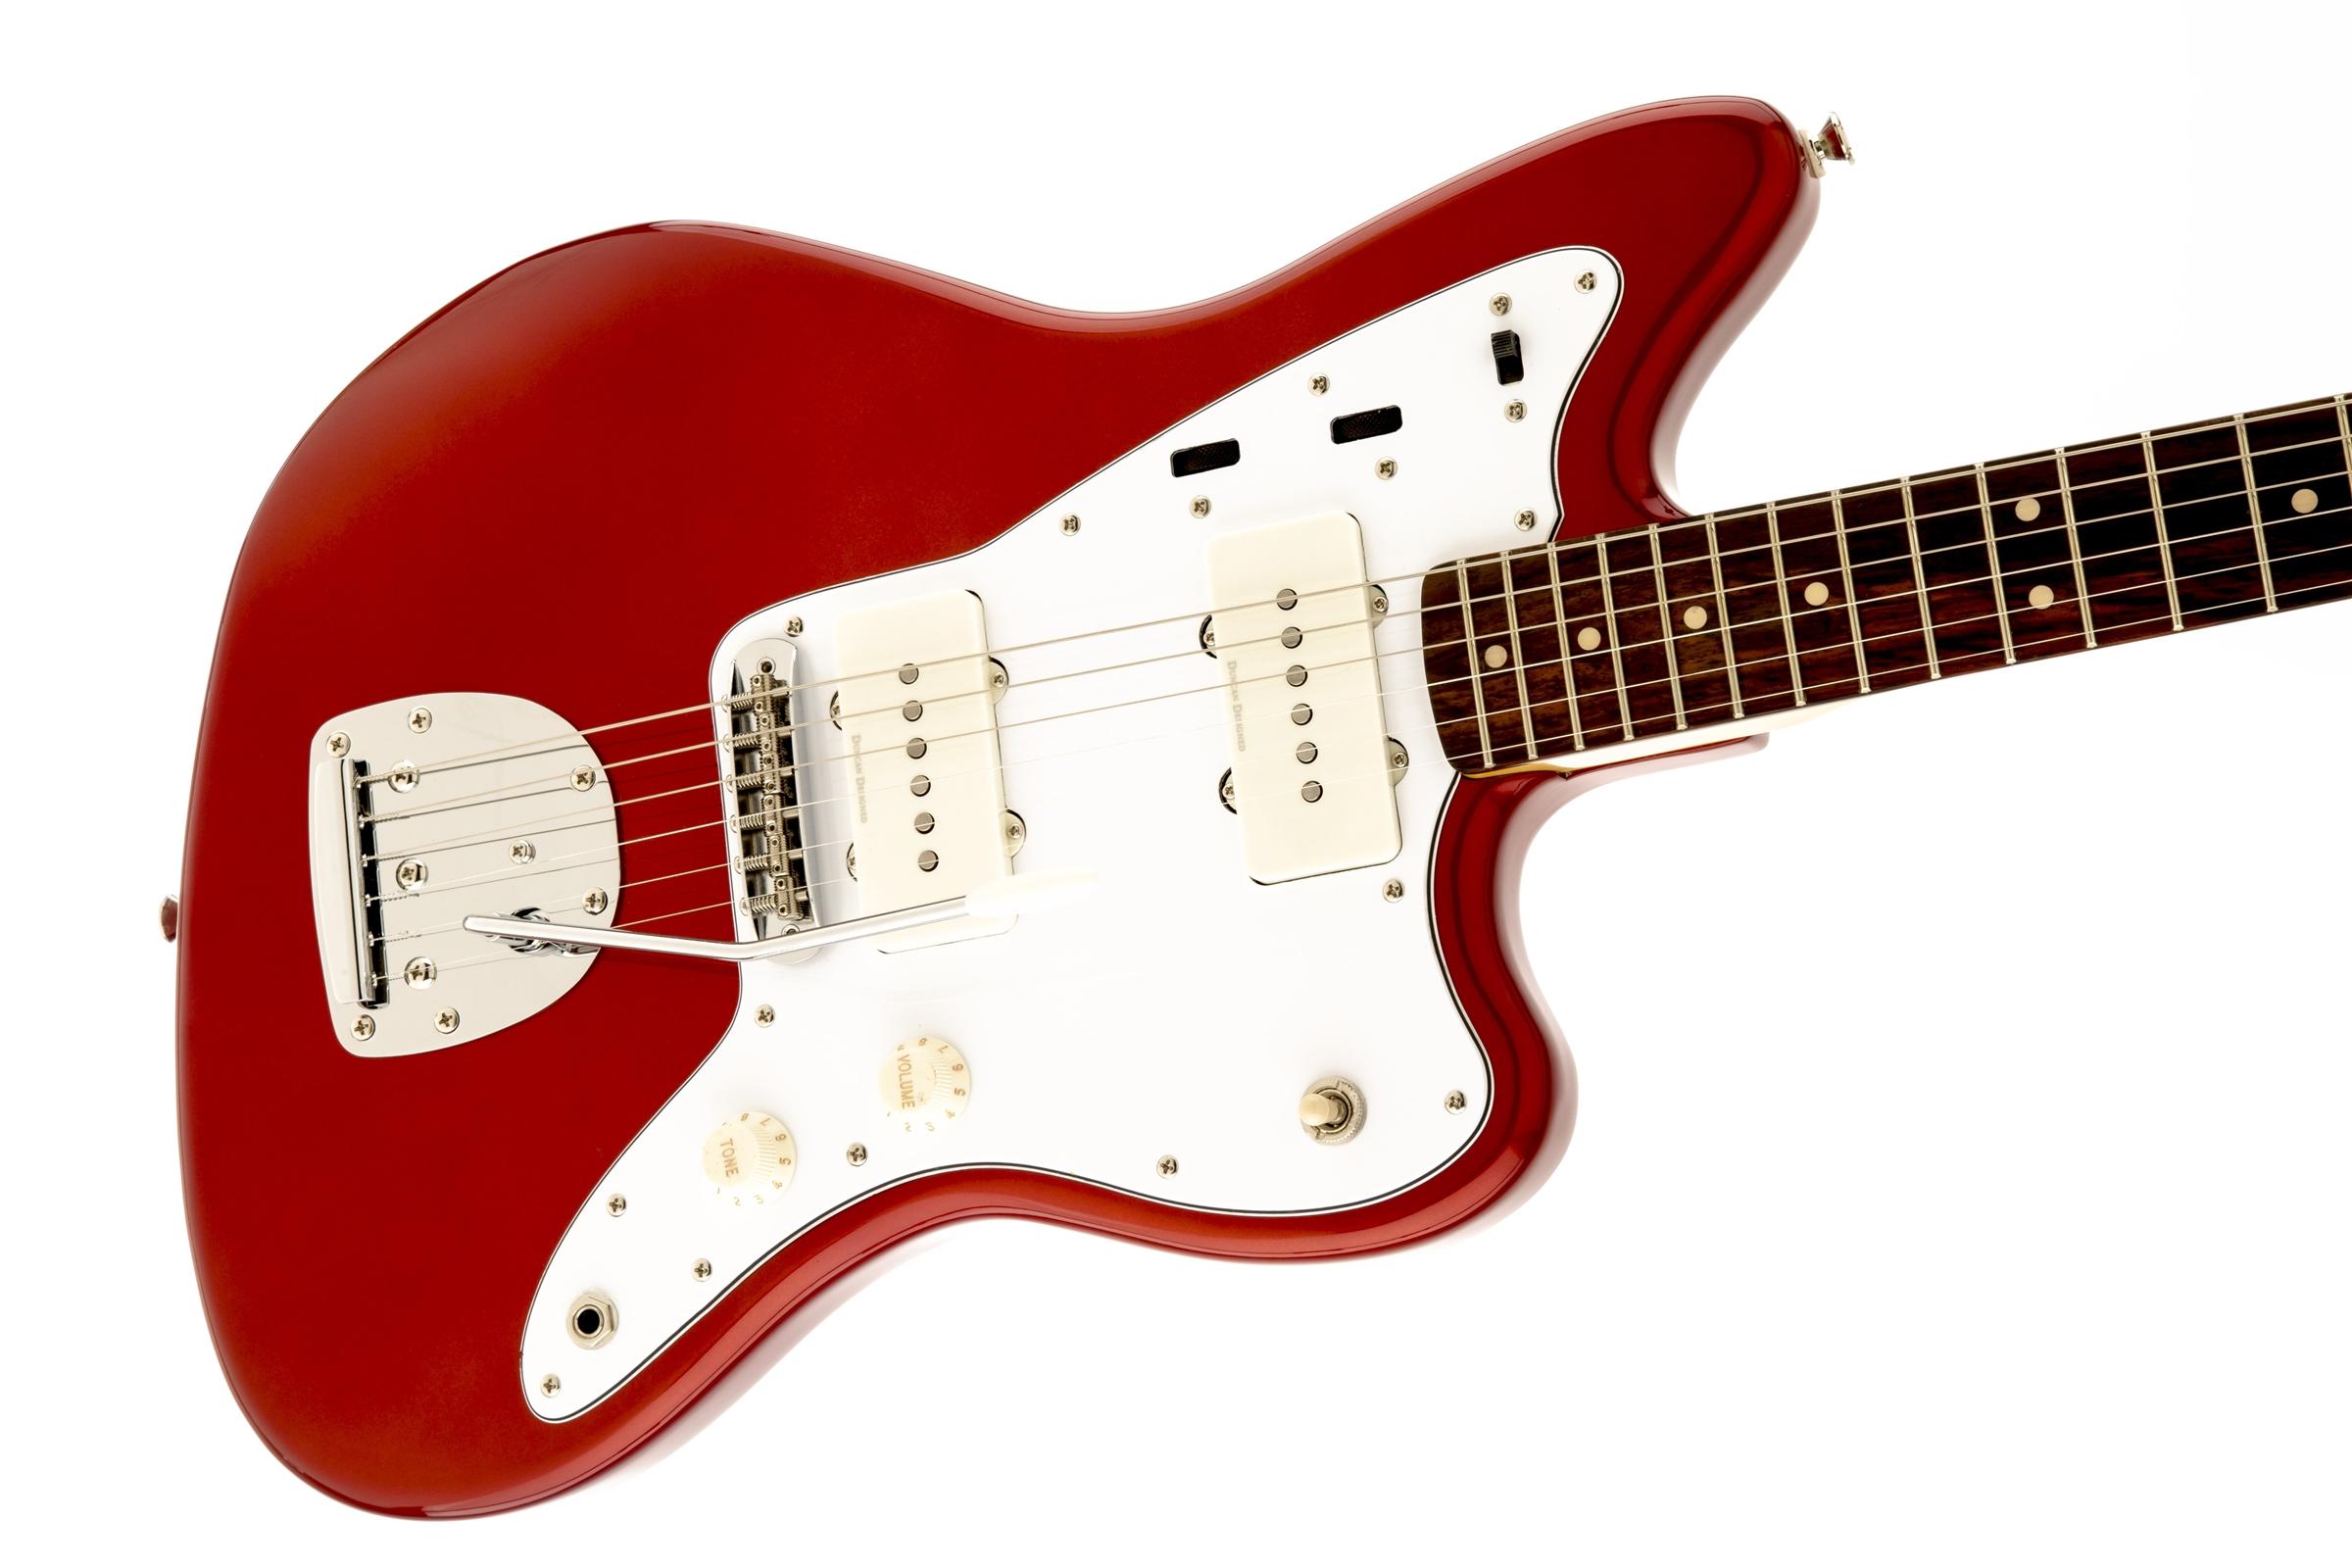 vintage modified jazzmaster squier electric guitars. Black Bedroom Furniture Sets. Home Design Ideas